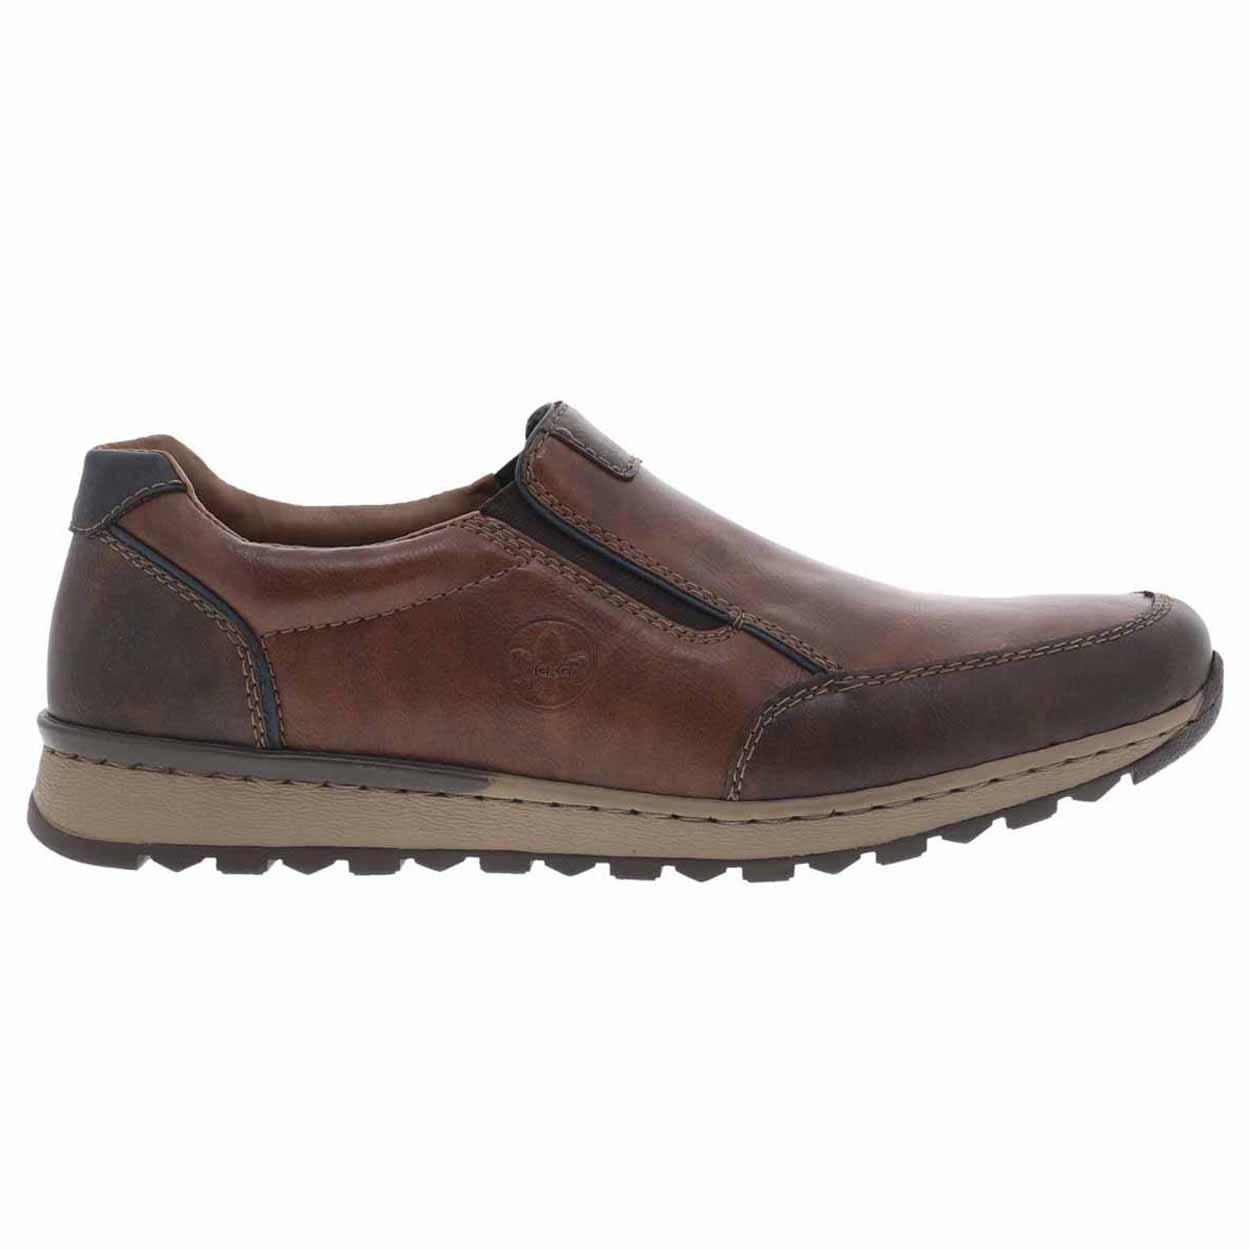 Chaussures de ville Rieker marron. Chaussures de ville Rieker marron